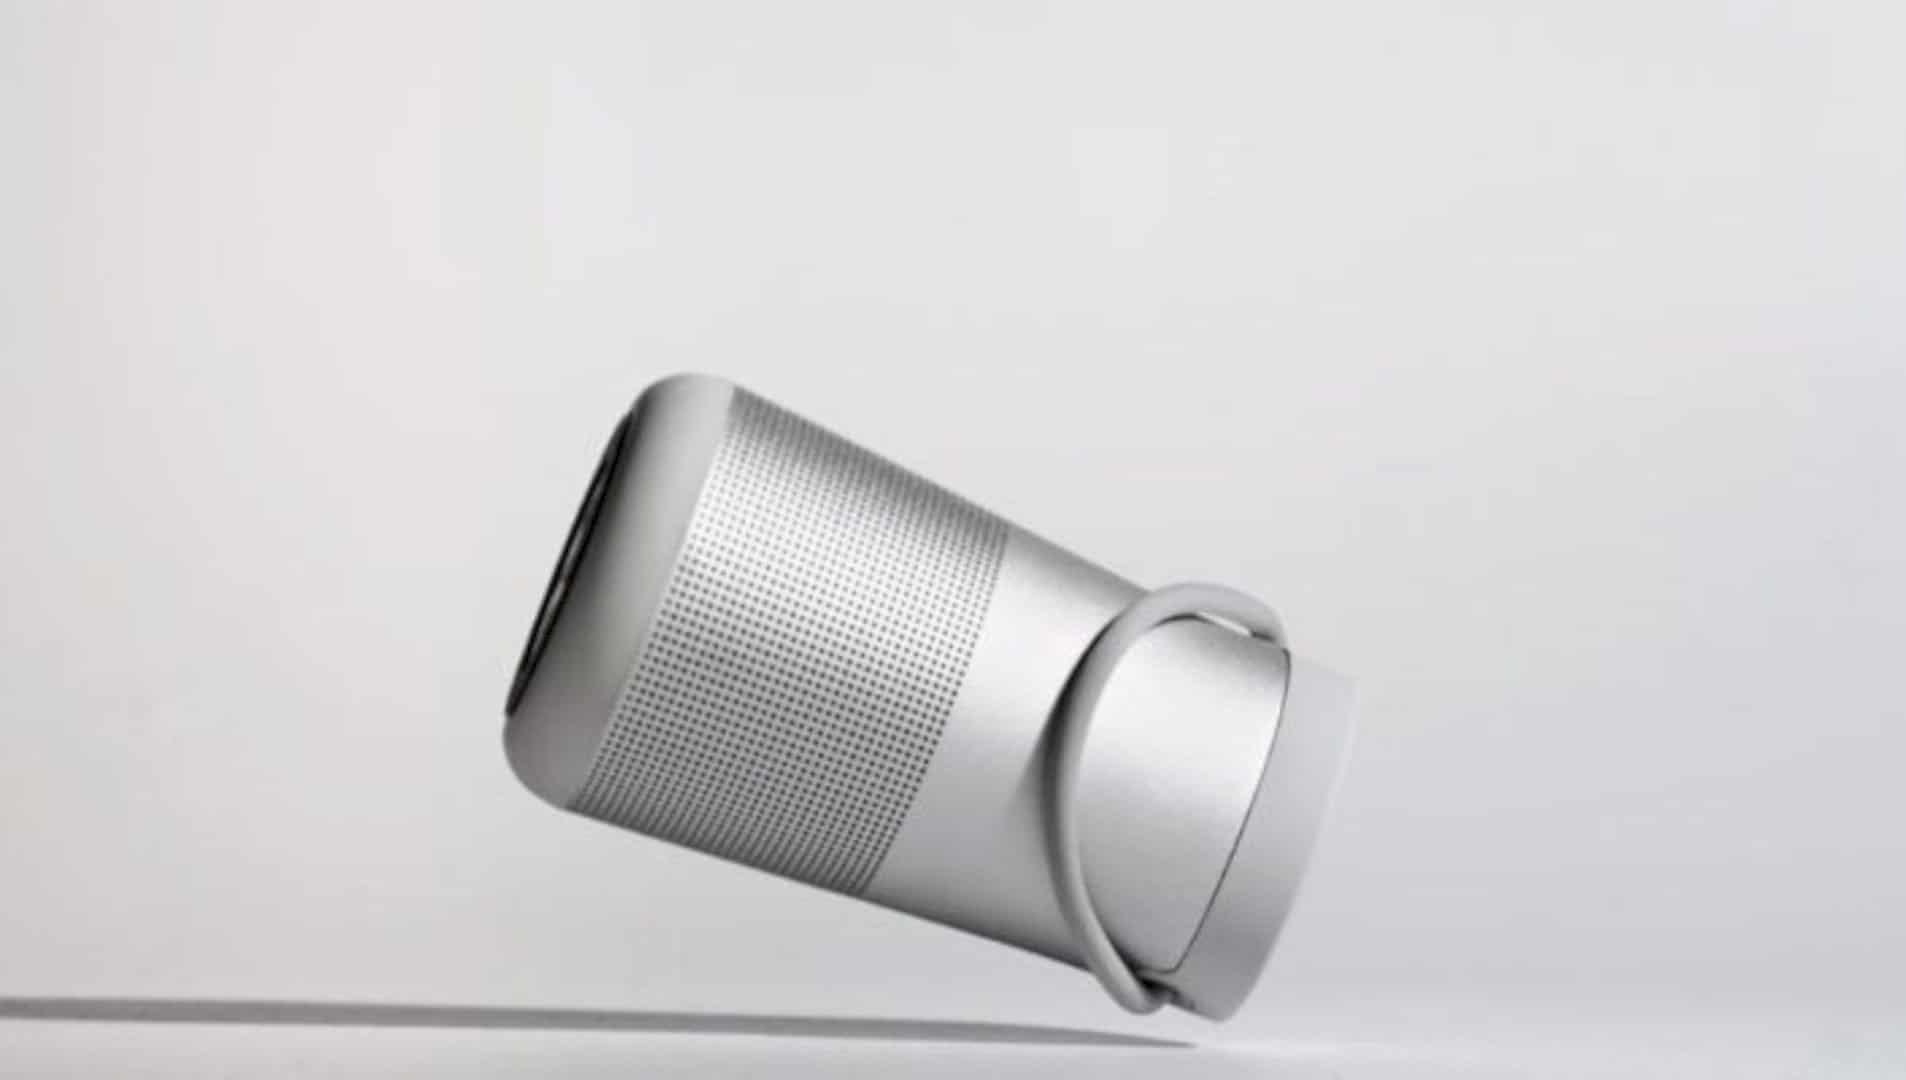 SoundLink Revolve 6